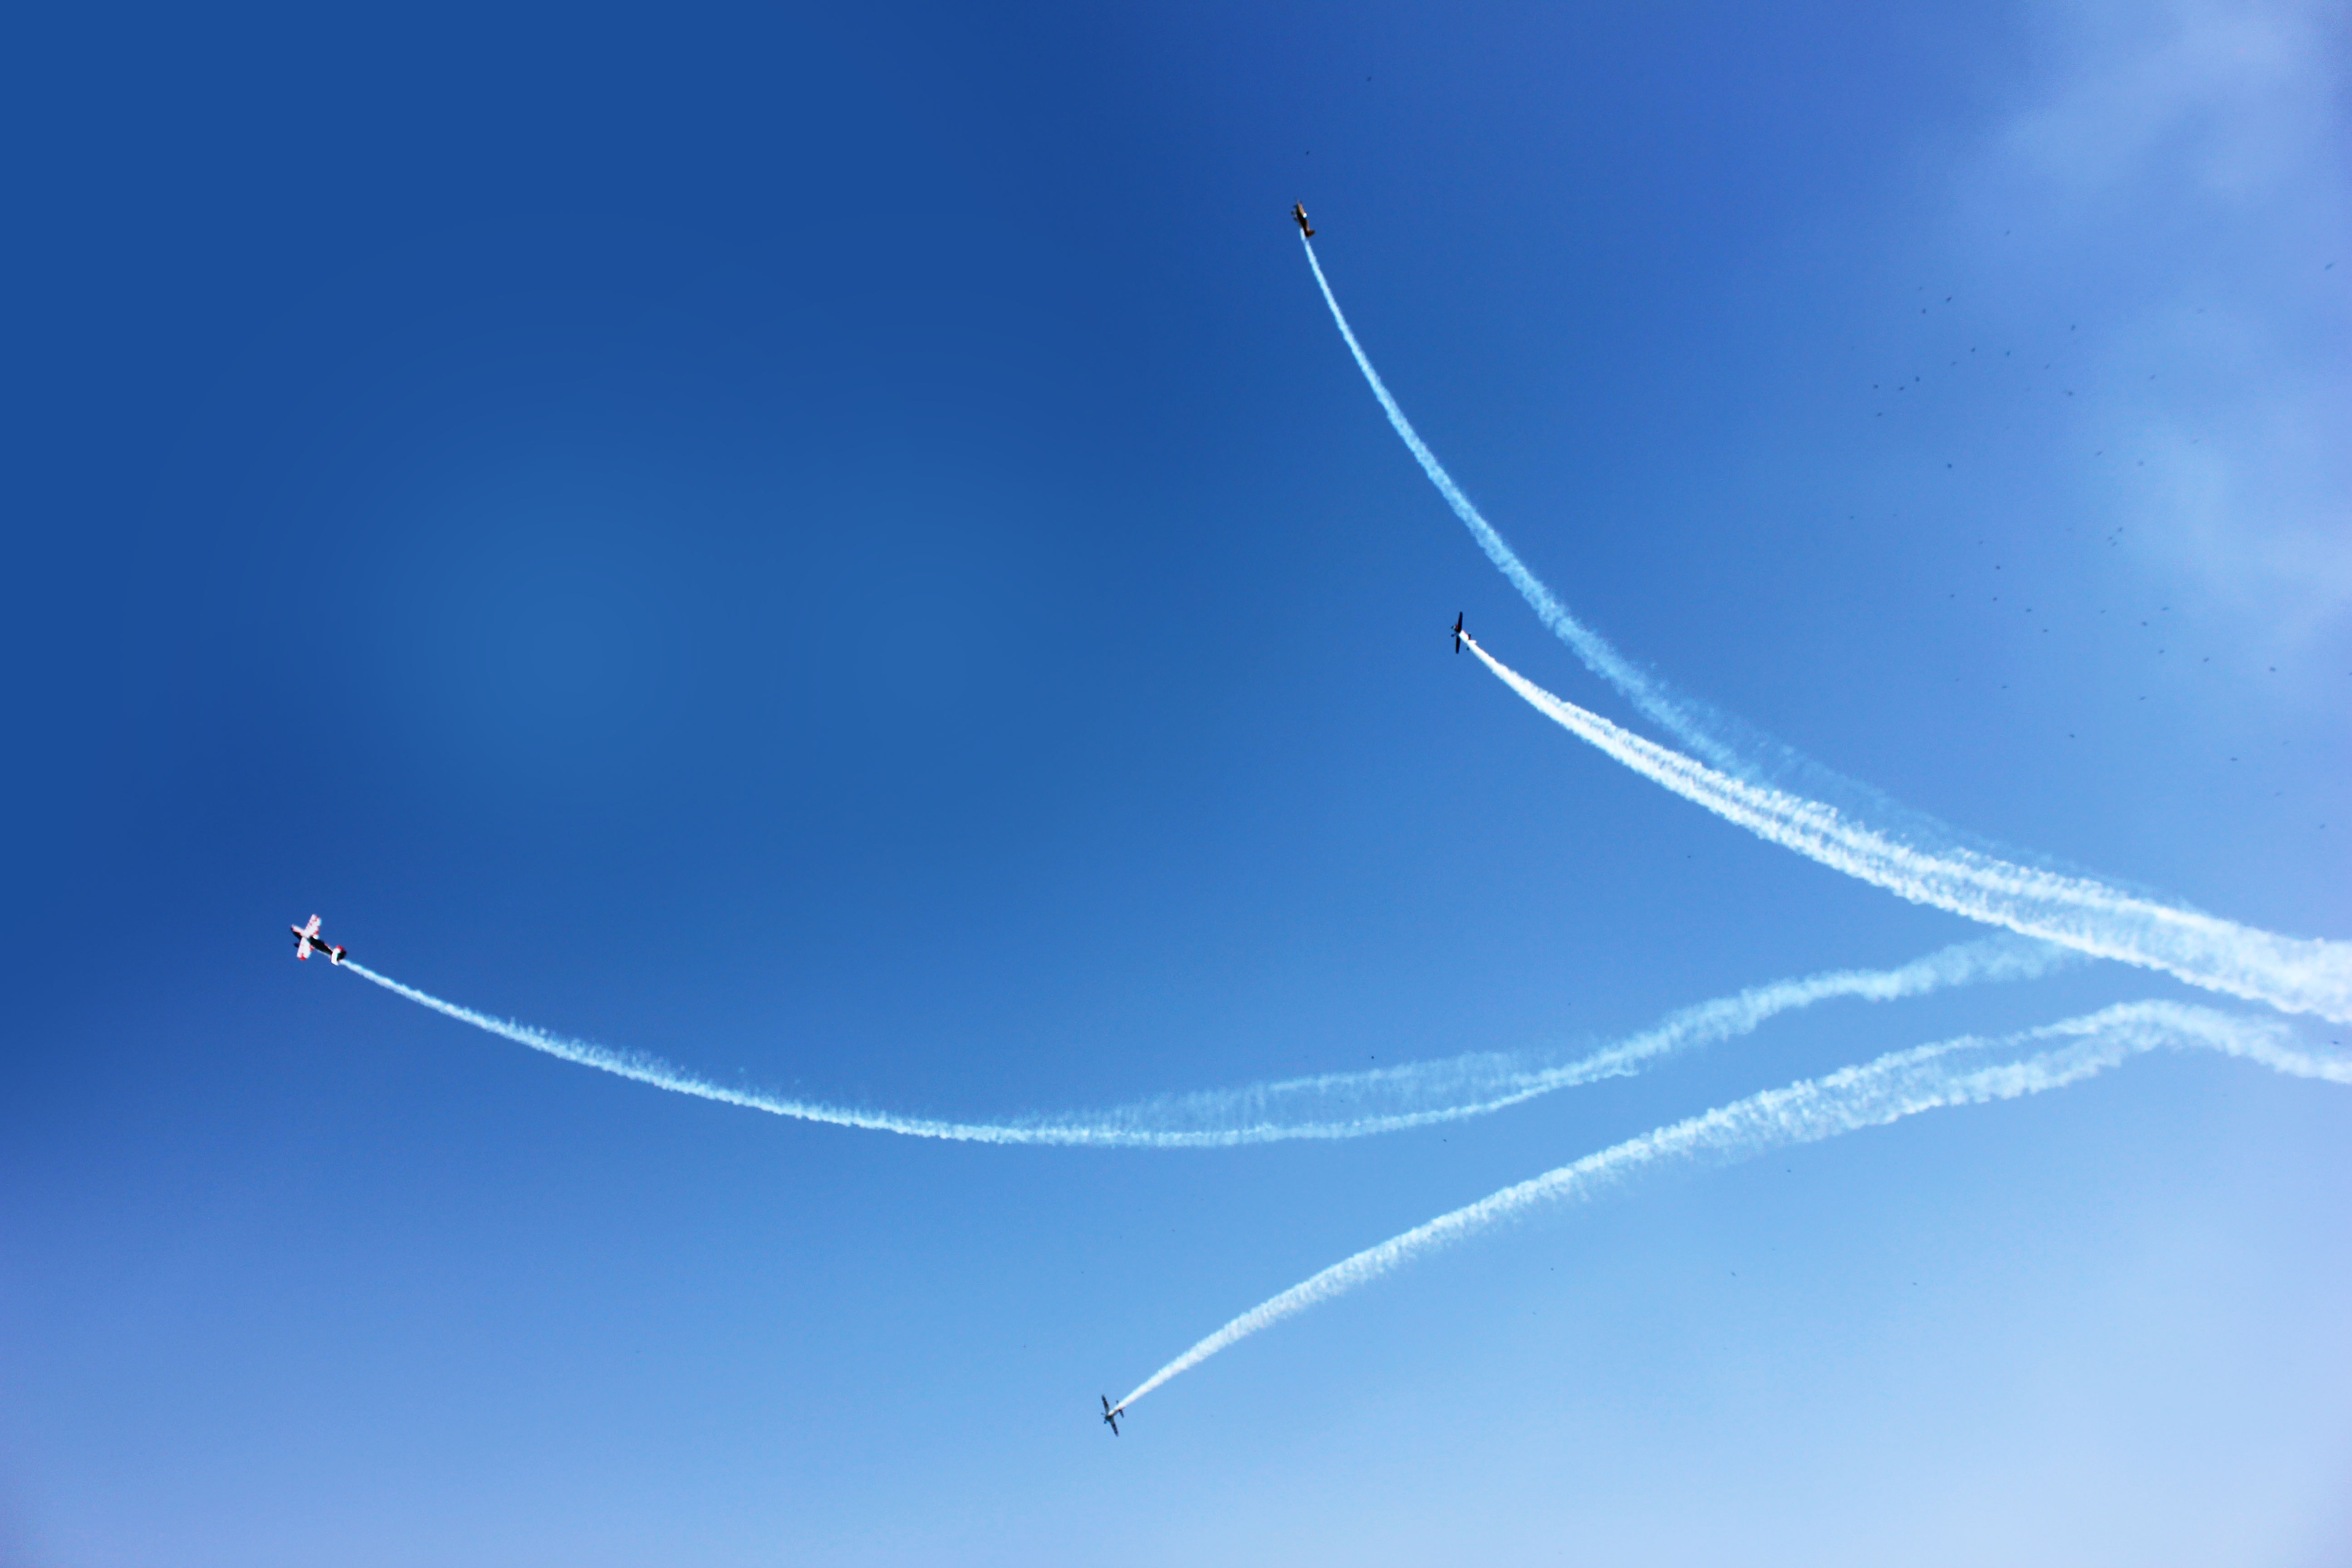 Jet plane show photo